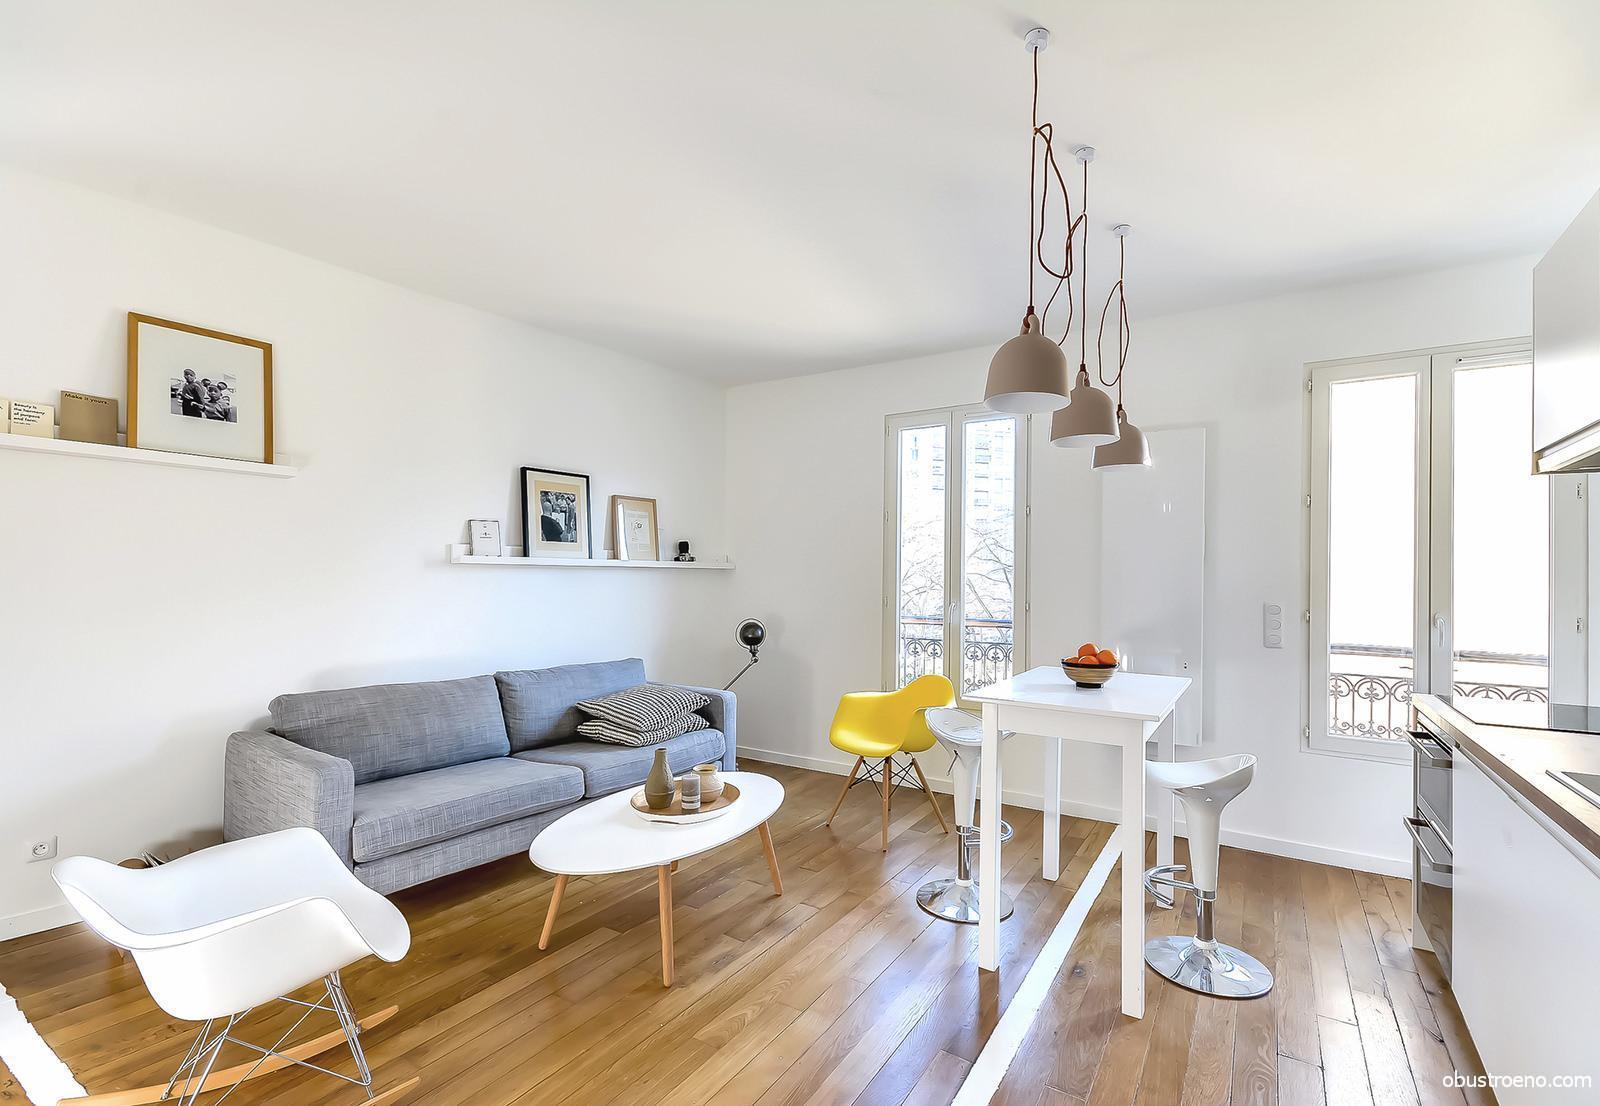 Аренда квартиры студии в париже